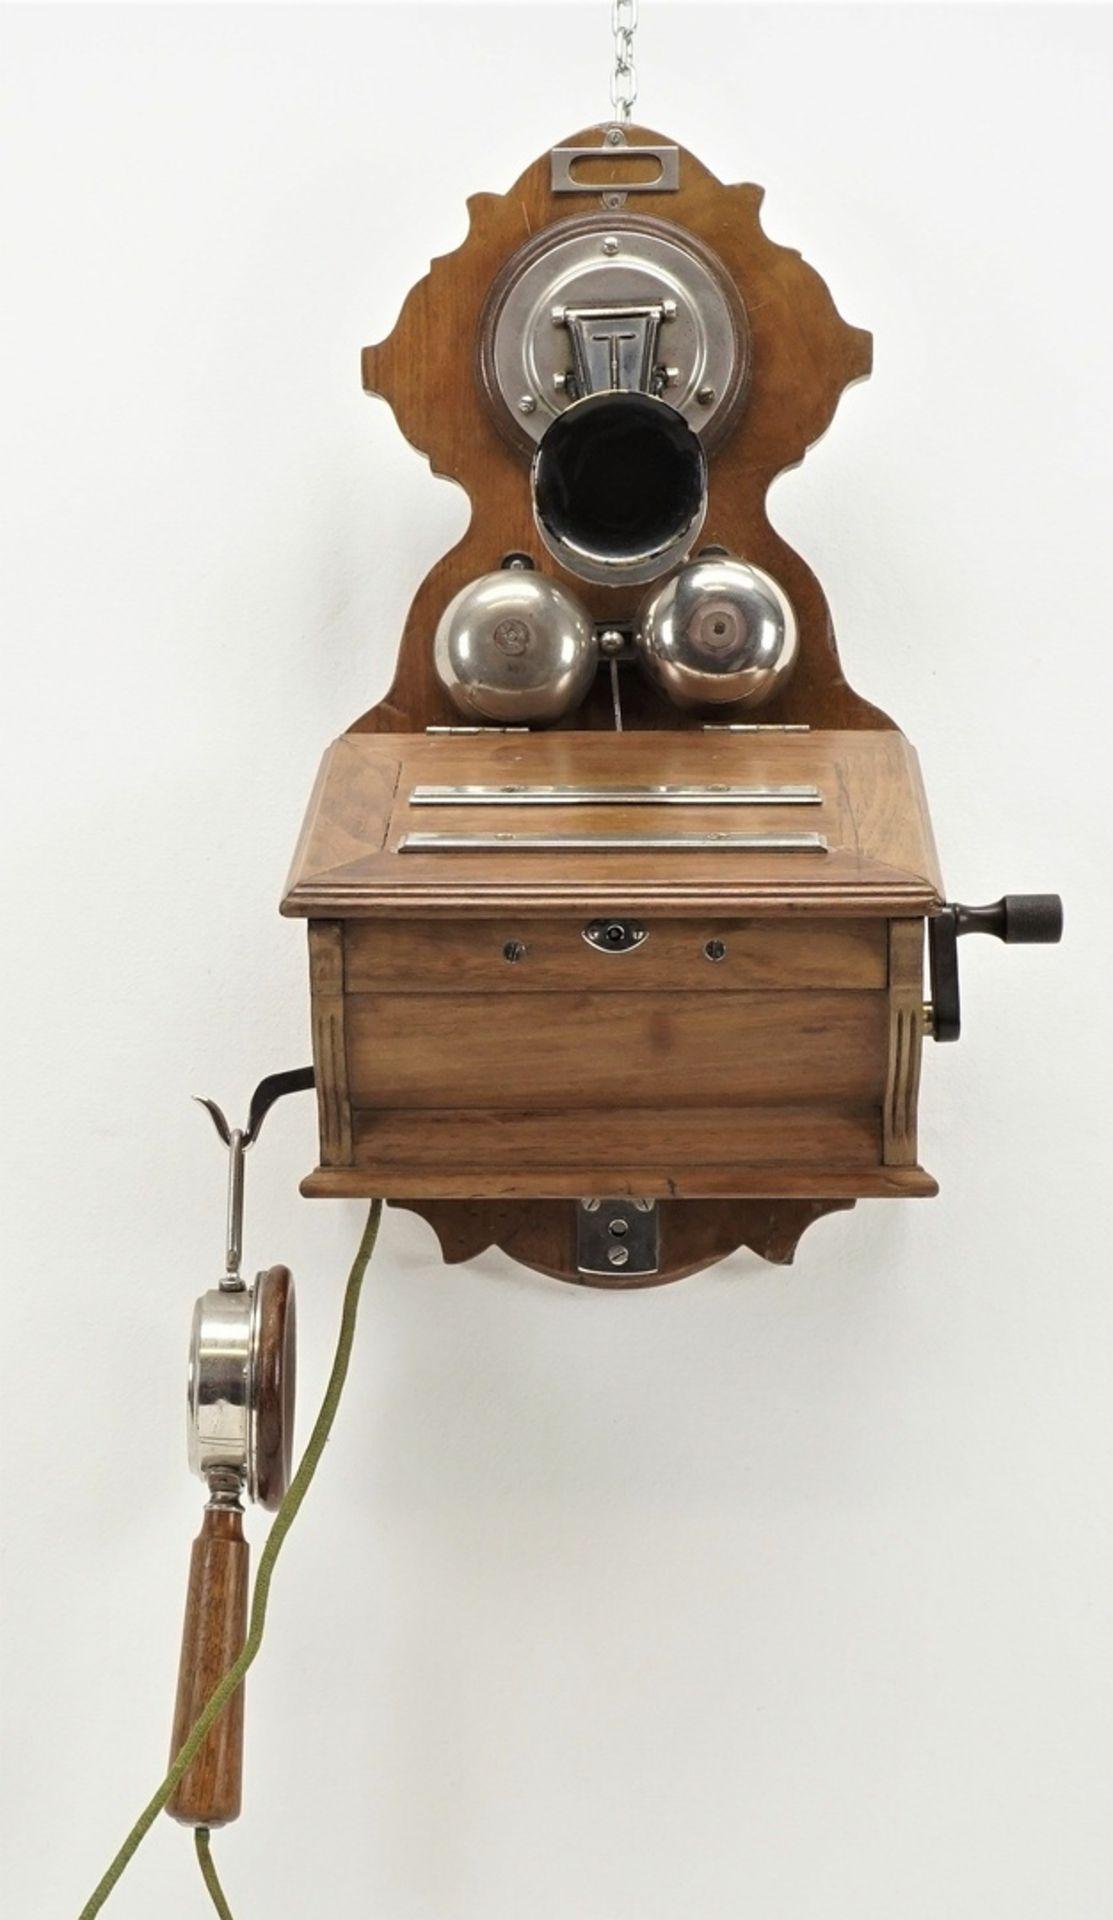 F. Schuchhardt Wandtelefon OB 04, um 1900 - Bild 4 aus 5